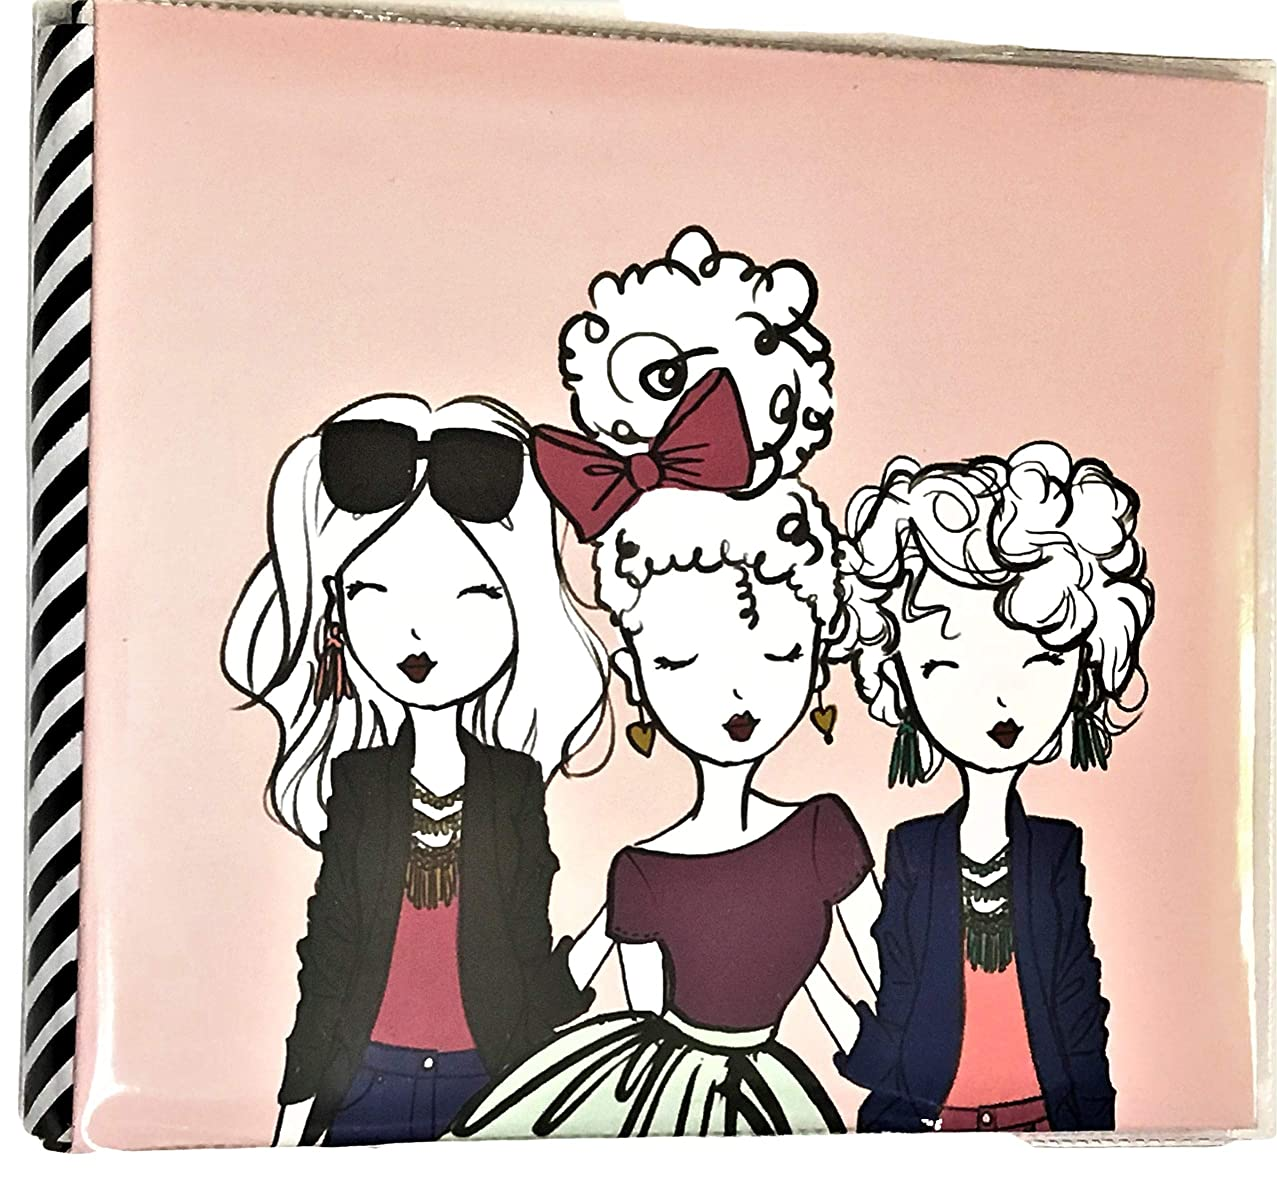 Elle Oh Elle Pre-Designed Pages 8 x 8 Pink Pretty Girls Photo Album,Just Add Photos, Best Friends,Gift